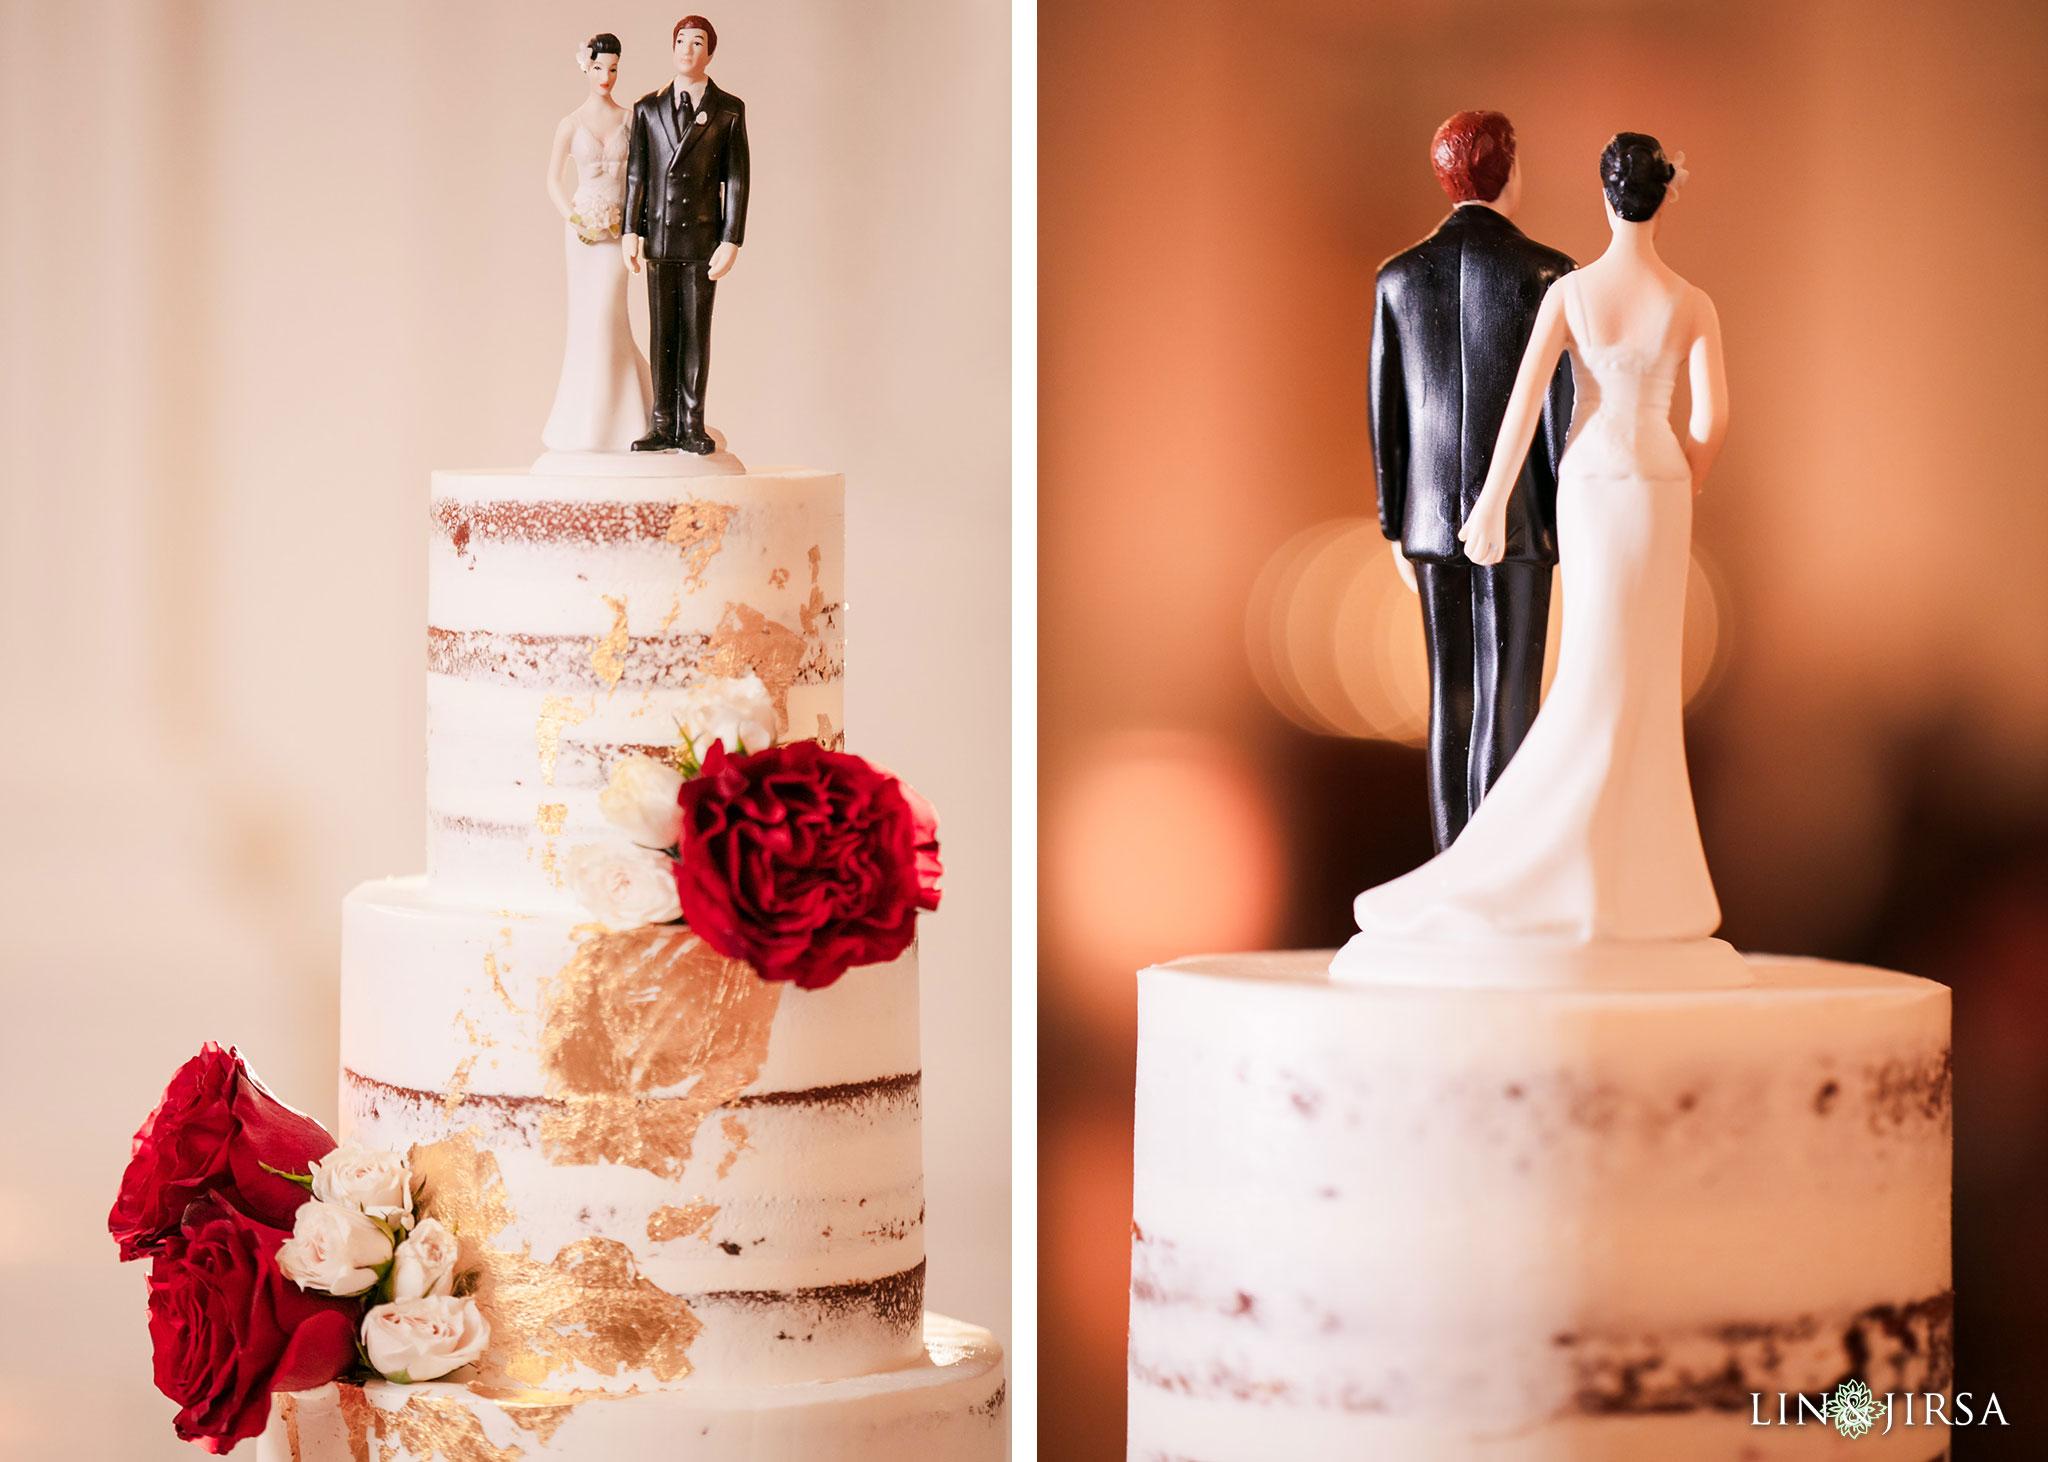 026 richard nixon library wedding reception photography 1